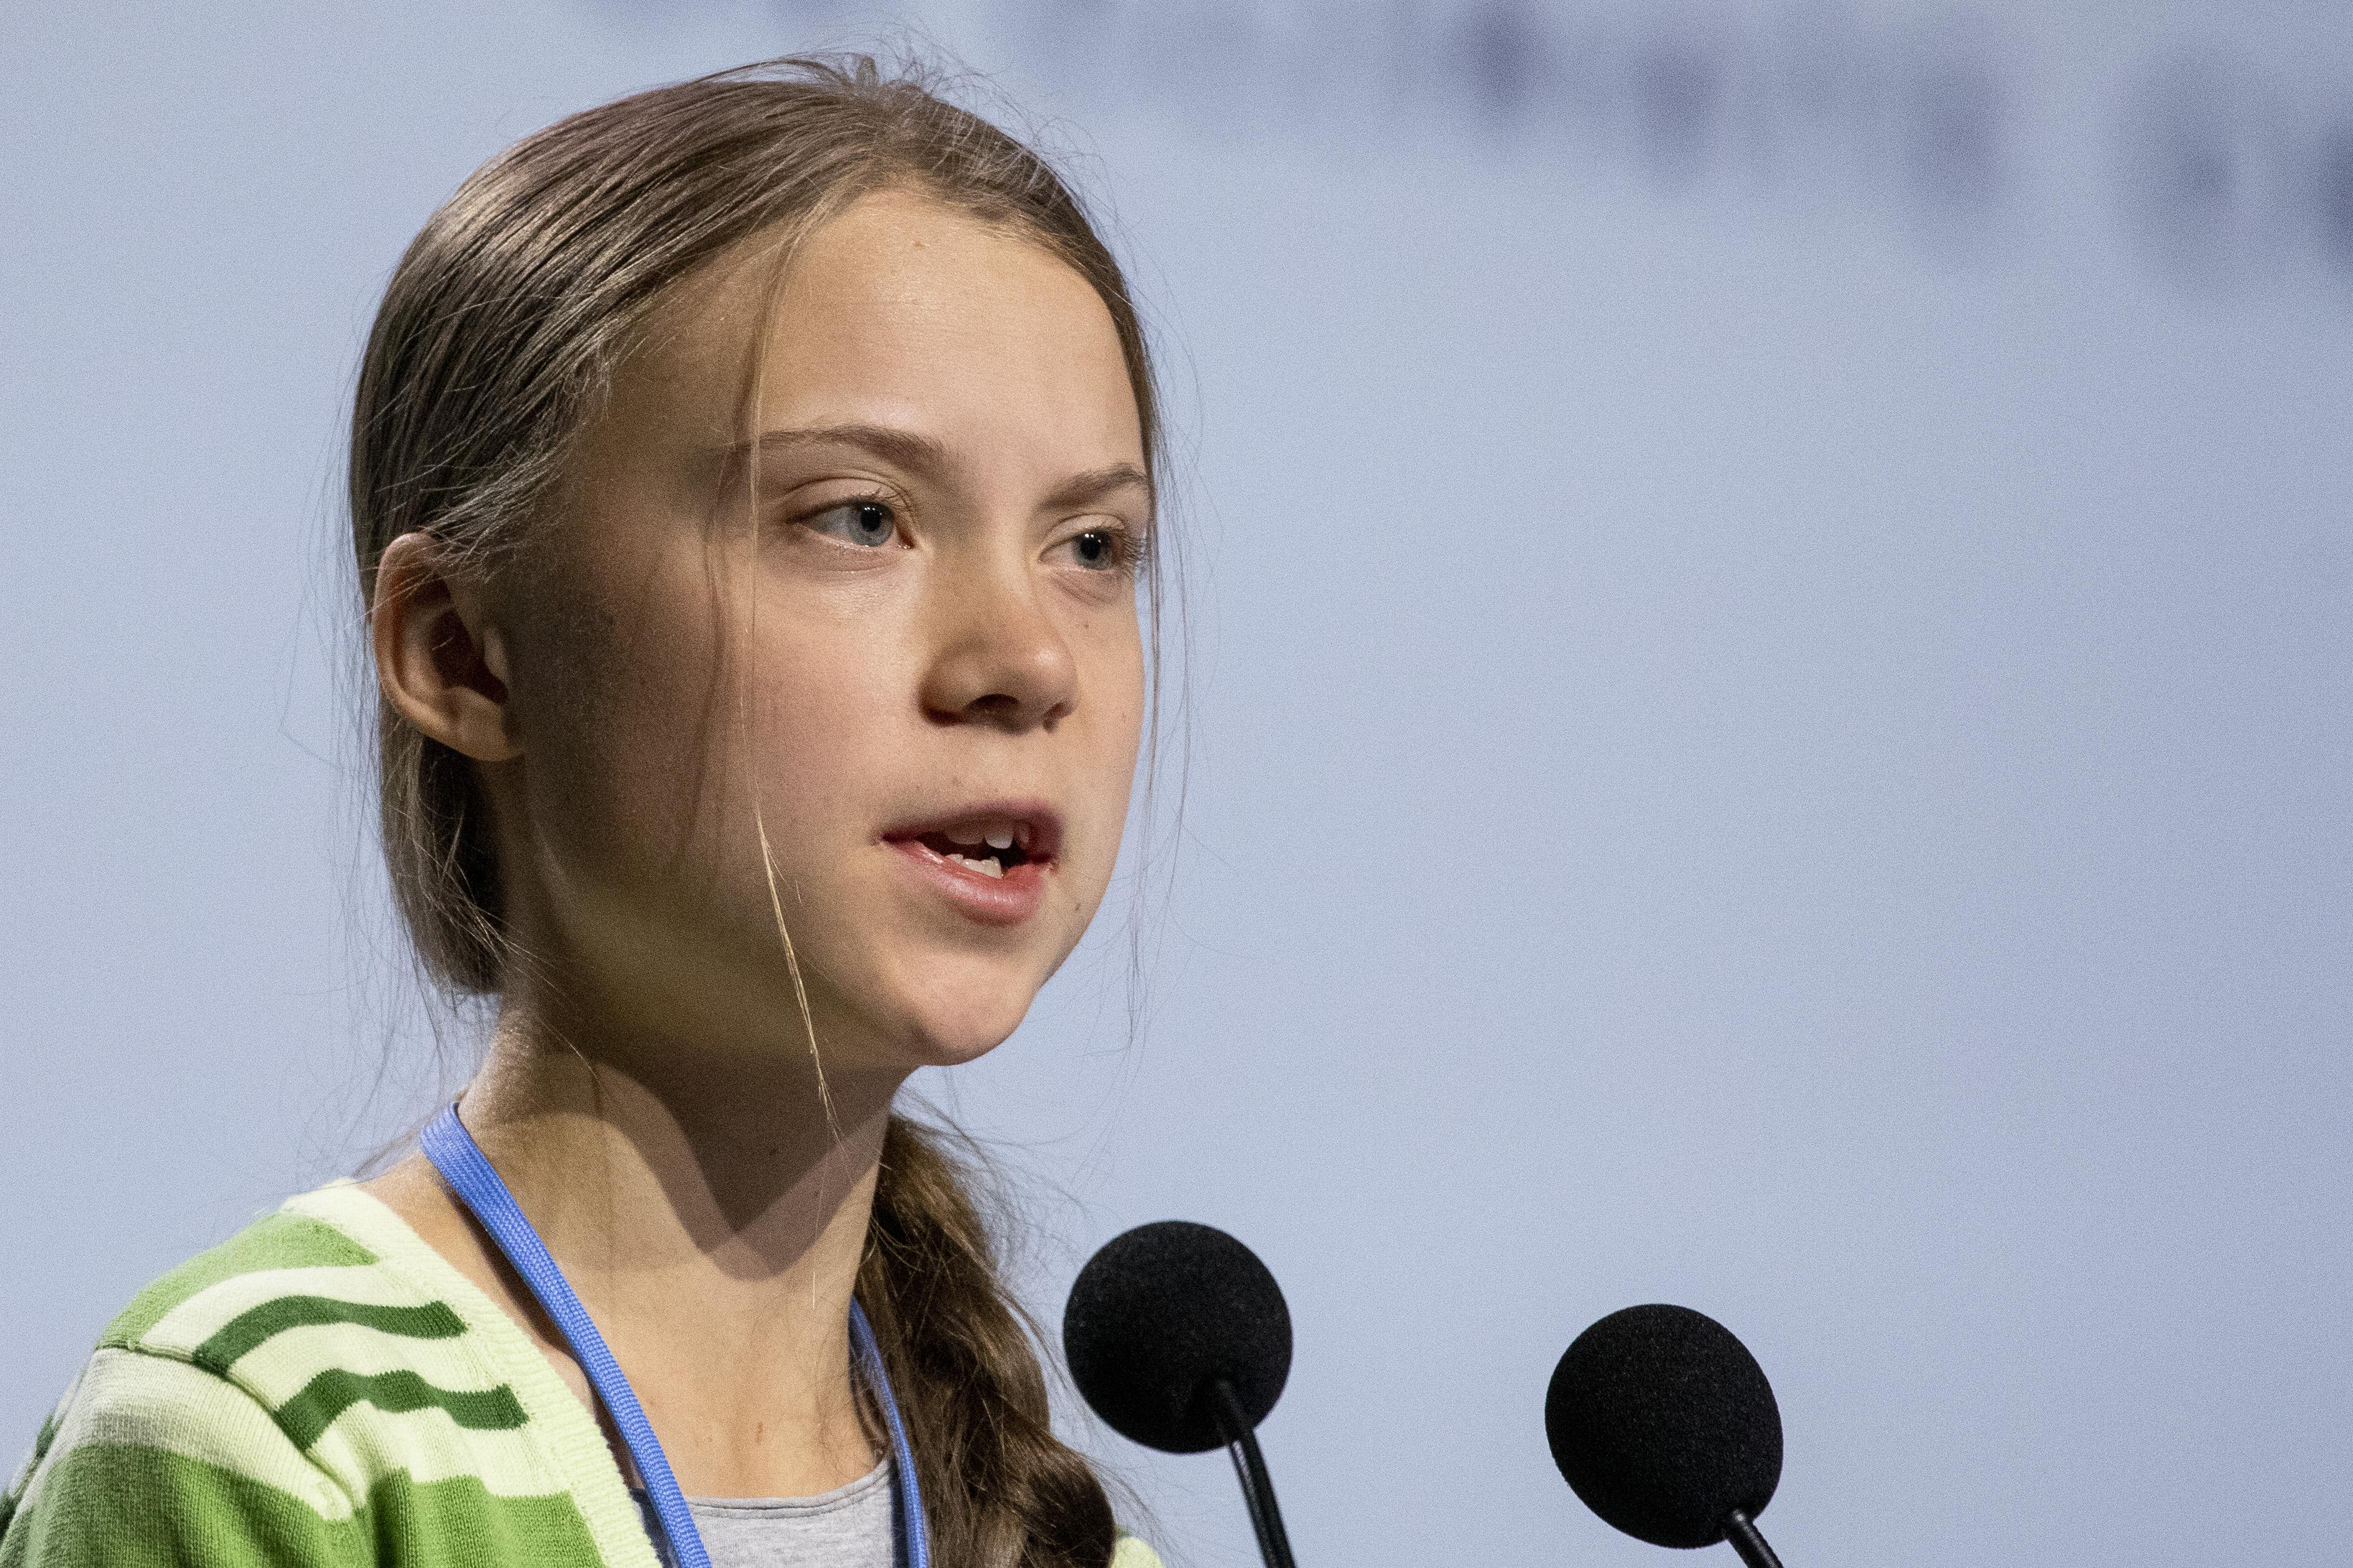 Greta Thunberg speaks into a microphone.